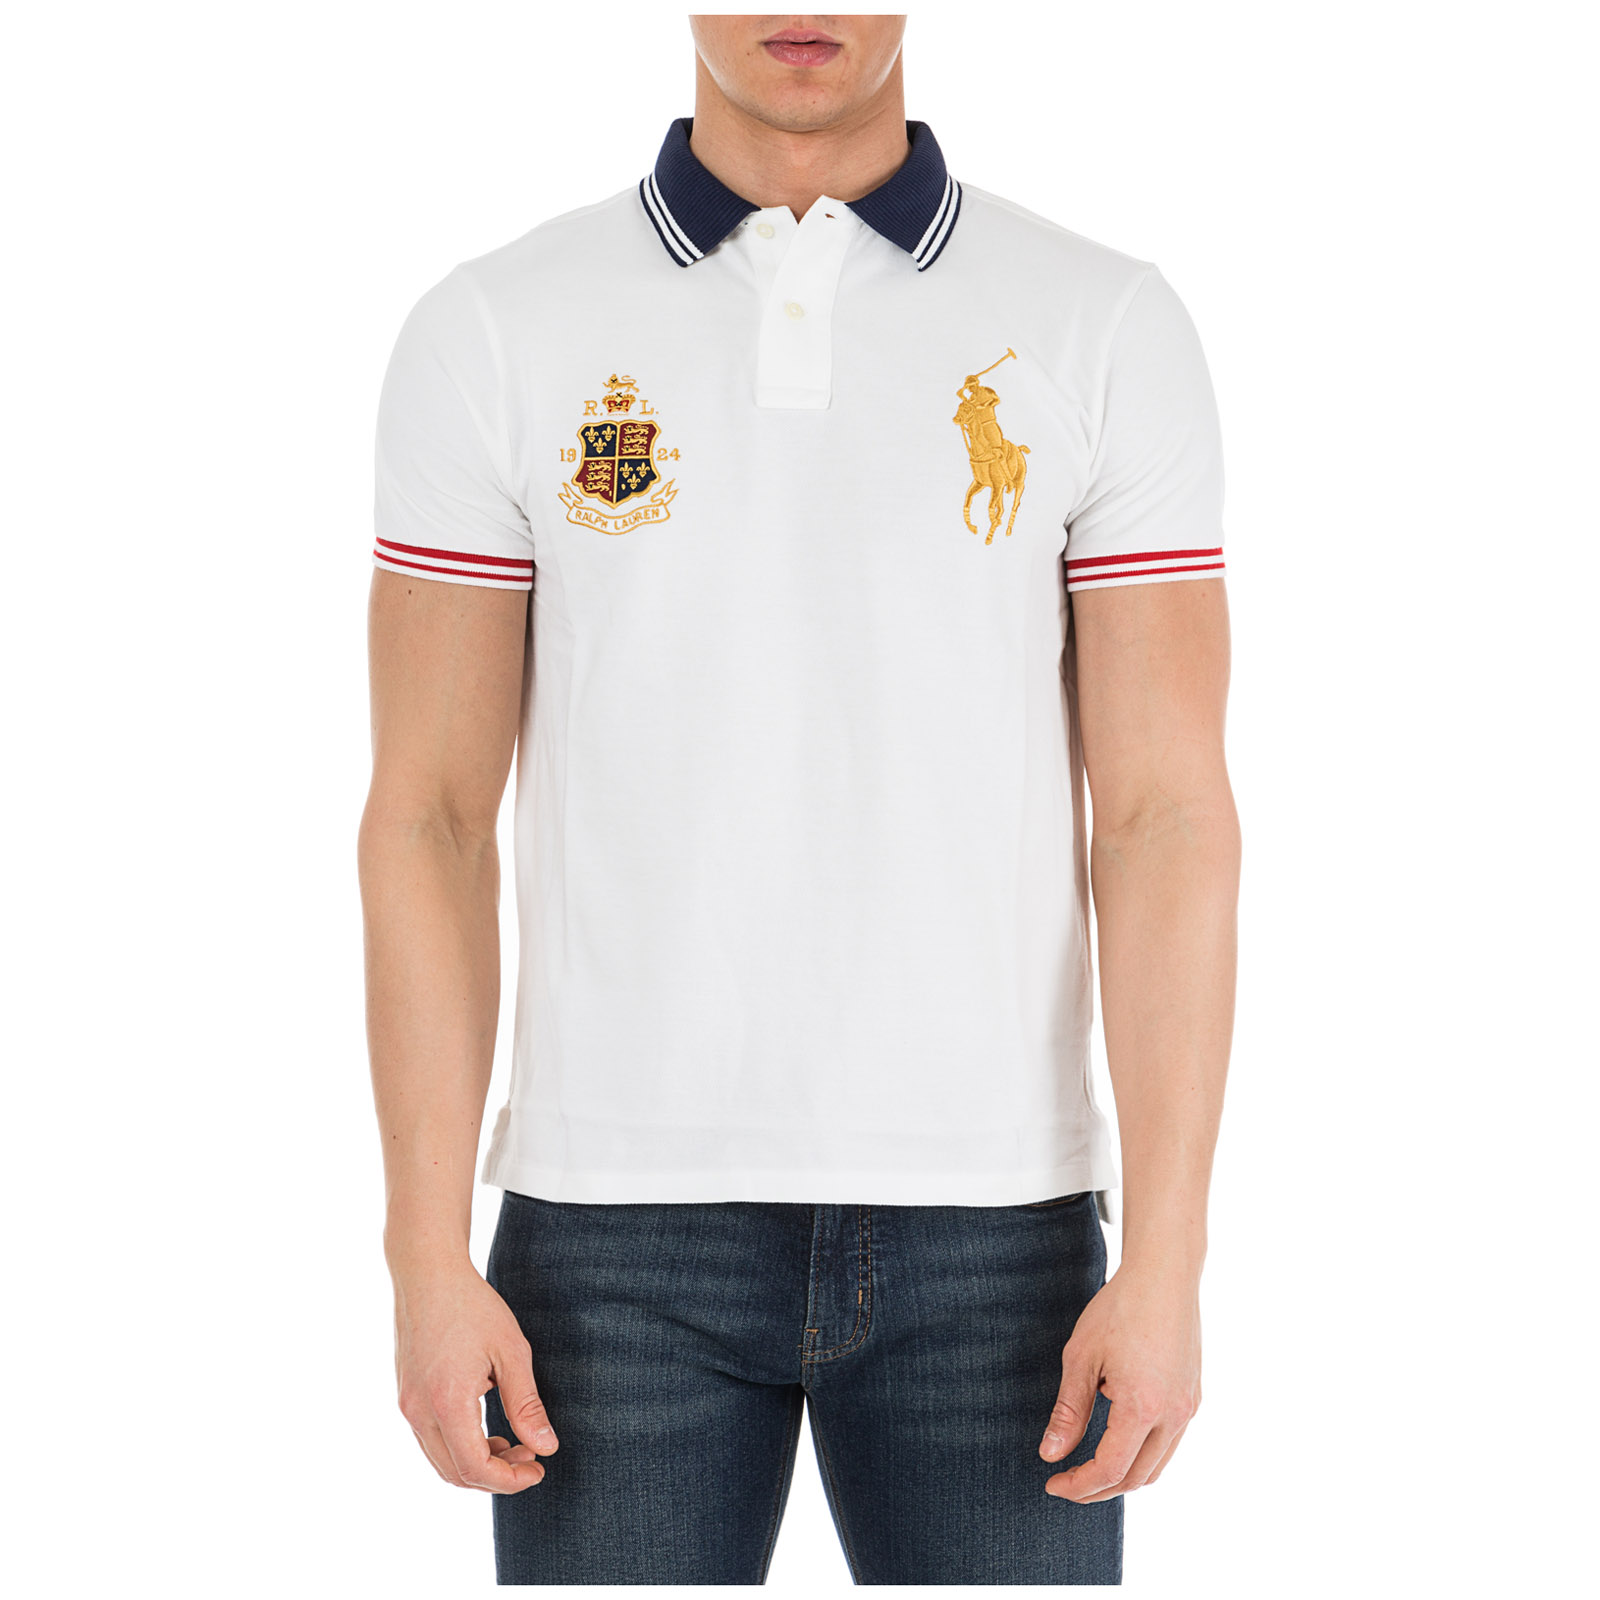 de8b3ca2bf2d Men's short sleeve t-shirt polo collar custom slim-fit ...